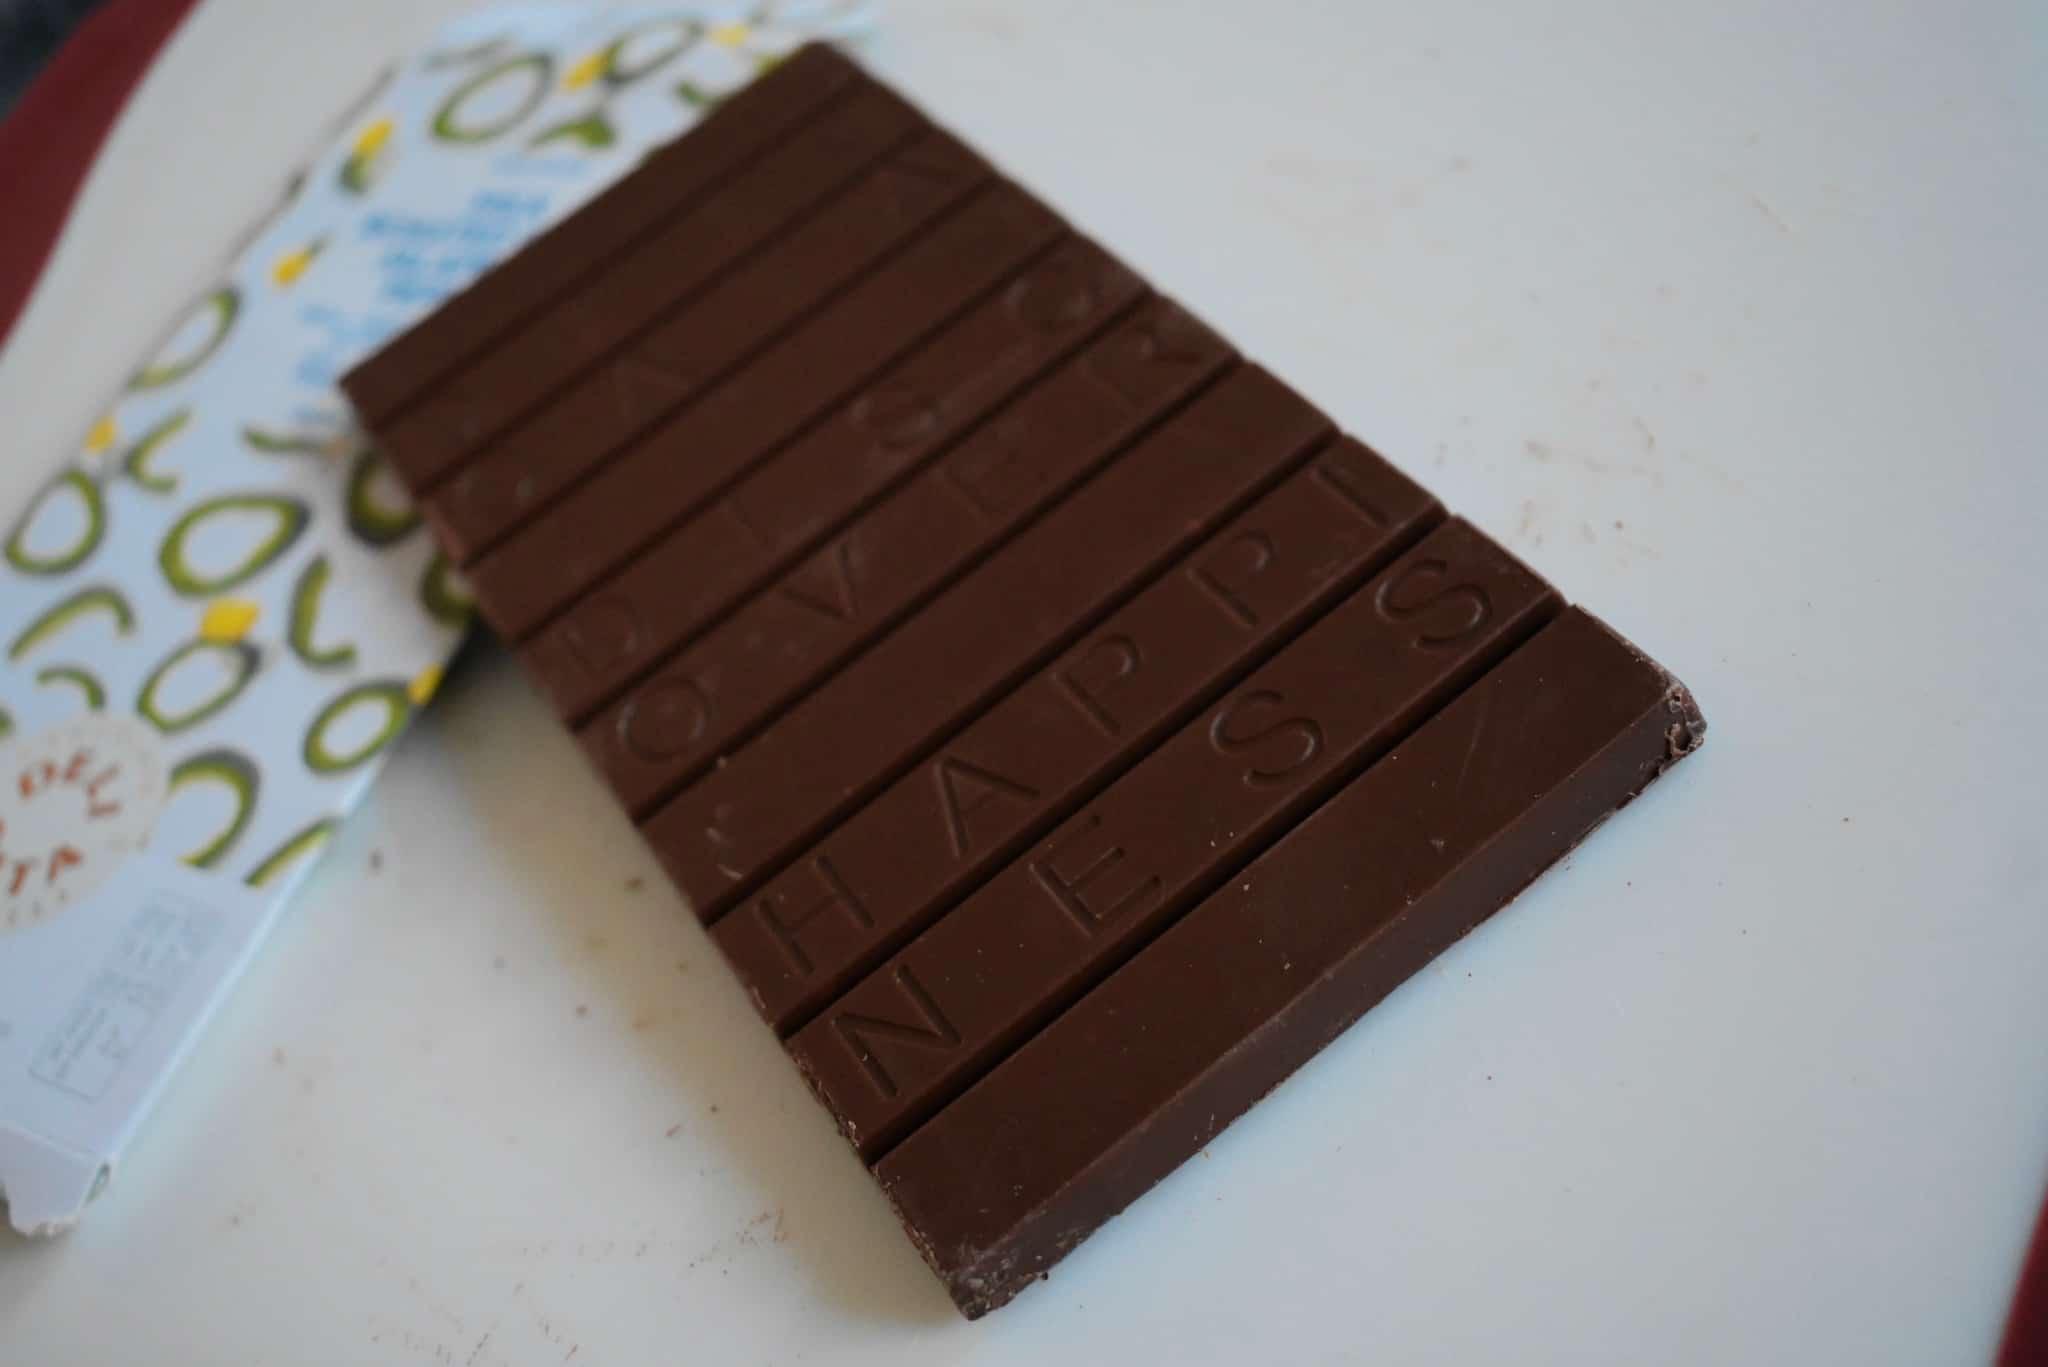 Delhaize Delicata Chocolade - Milk Roasted CornJalapeño Pepper